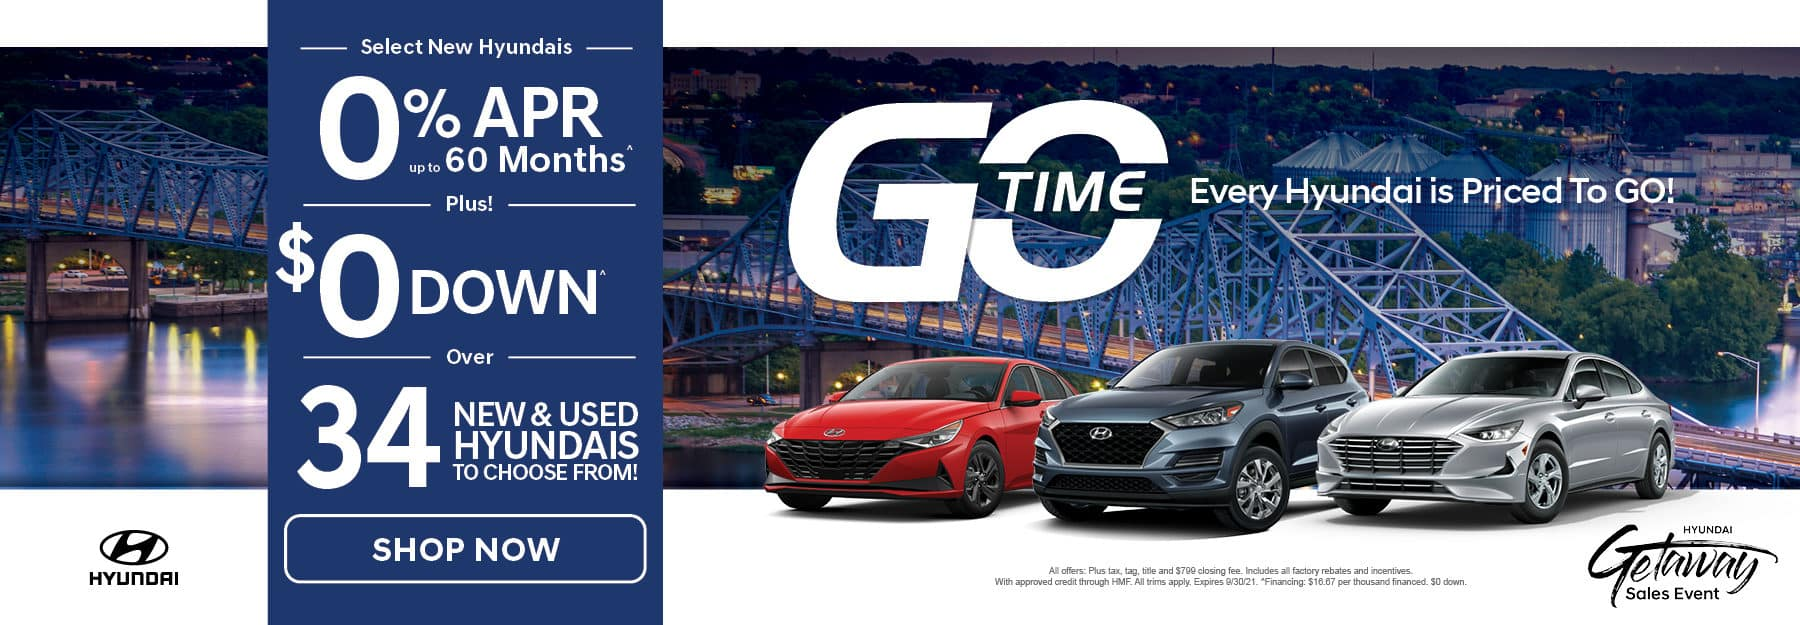 Go Time - New 2021 Hyundai Vehicles